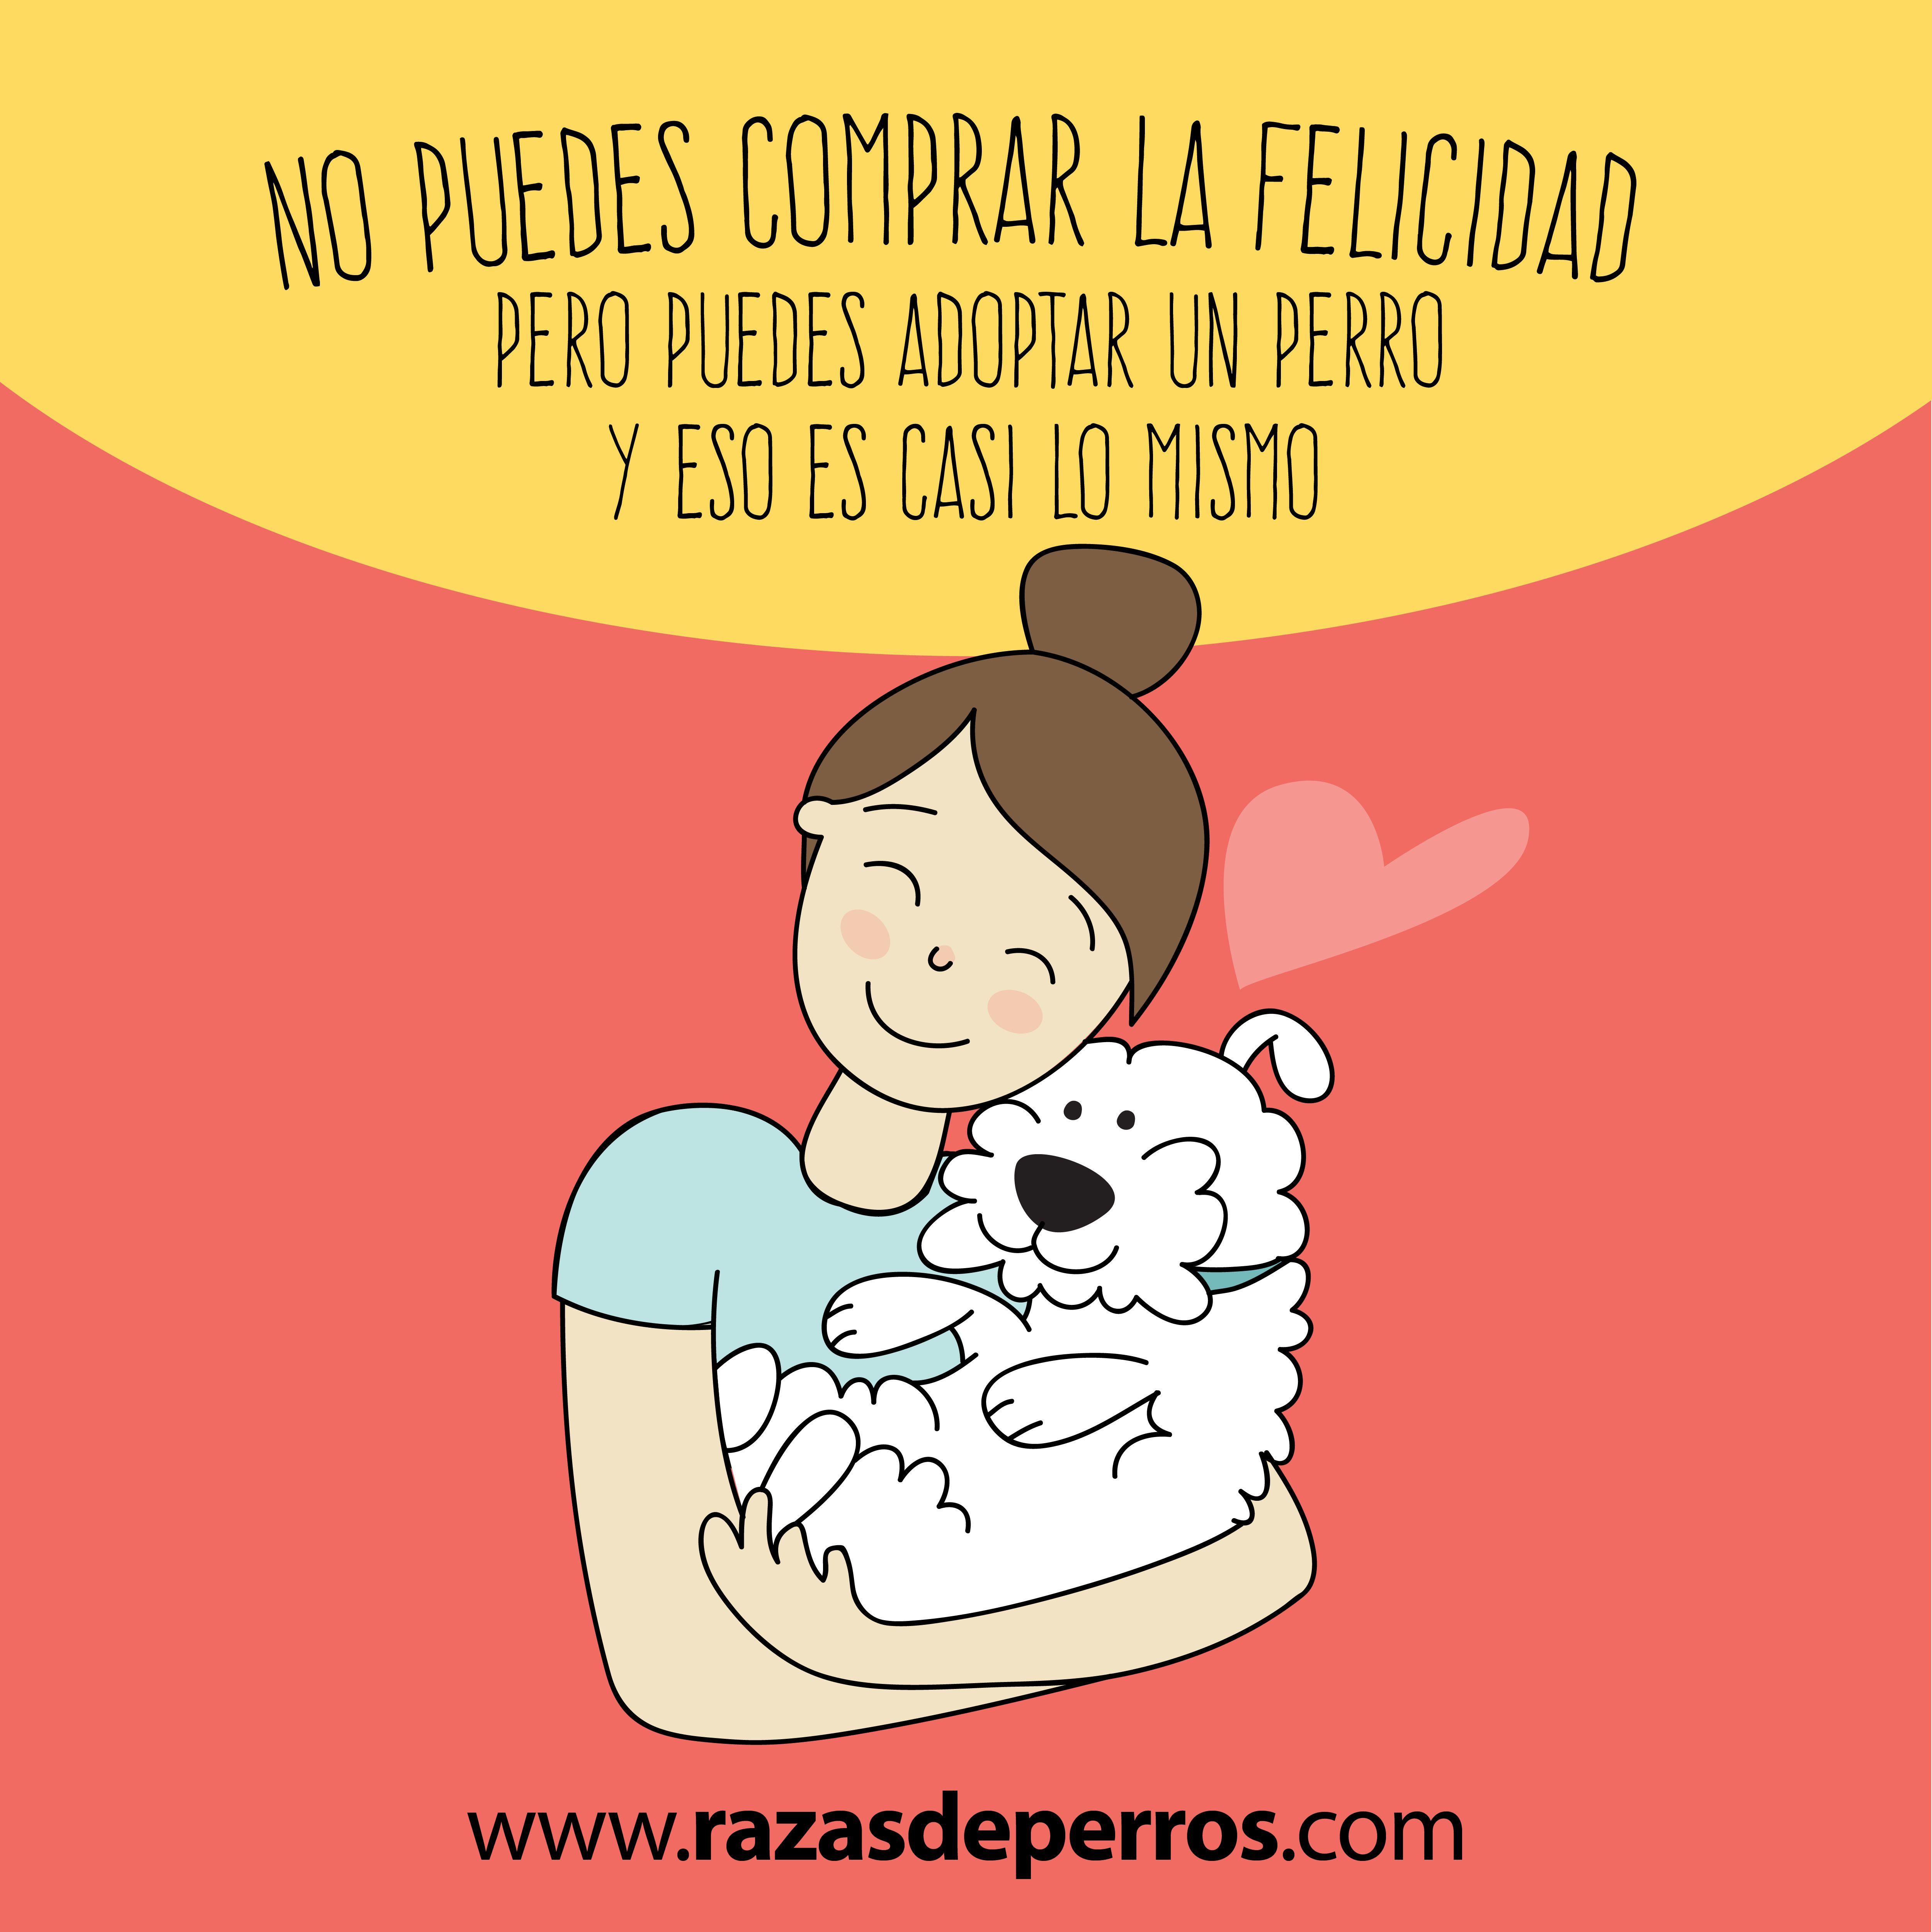 adoptar un perro da felicidad Animales YoRespeto